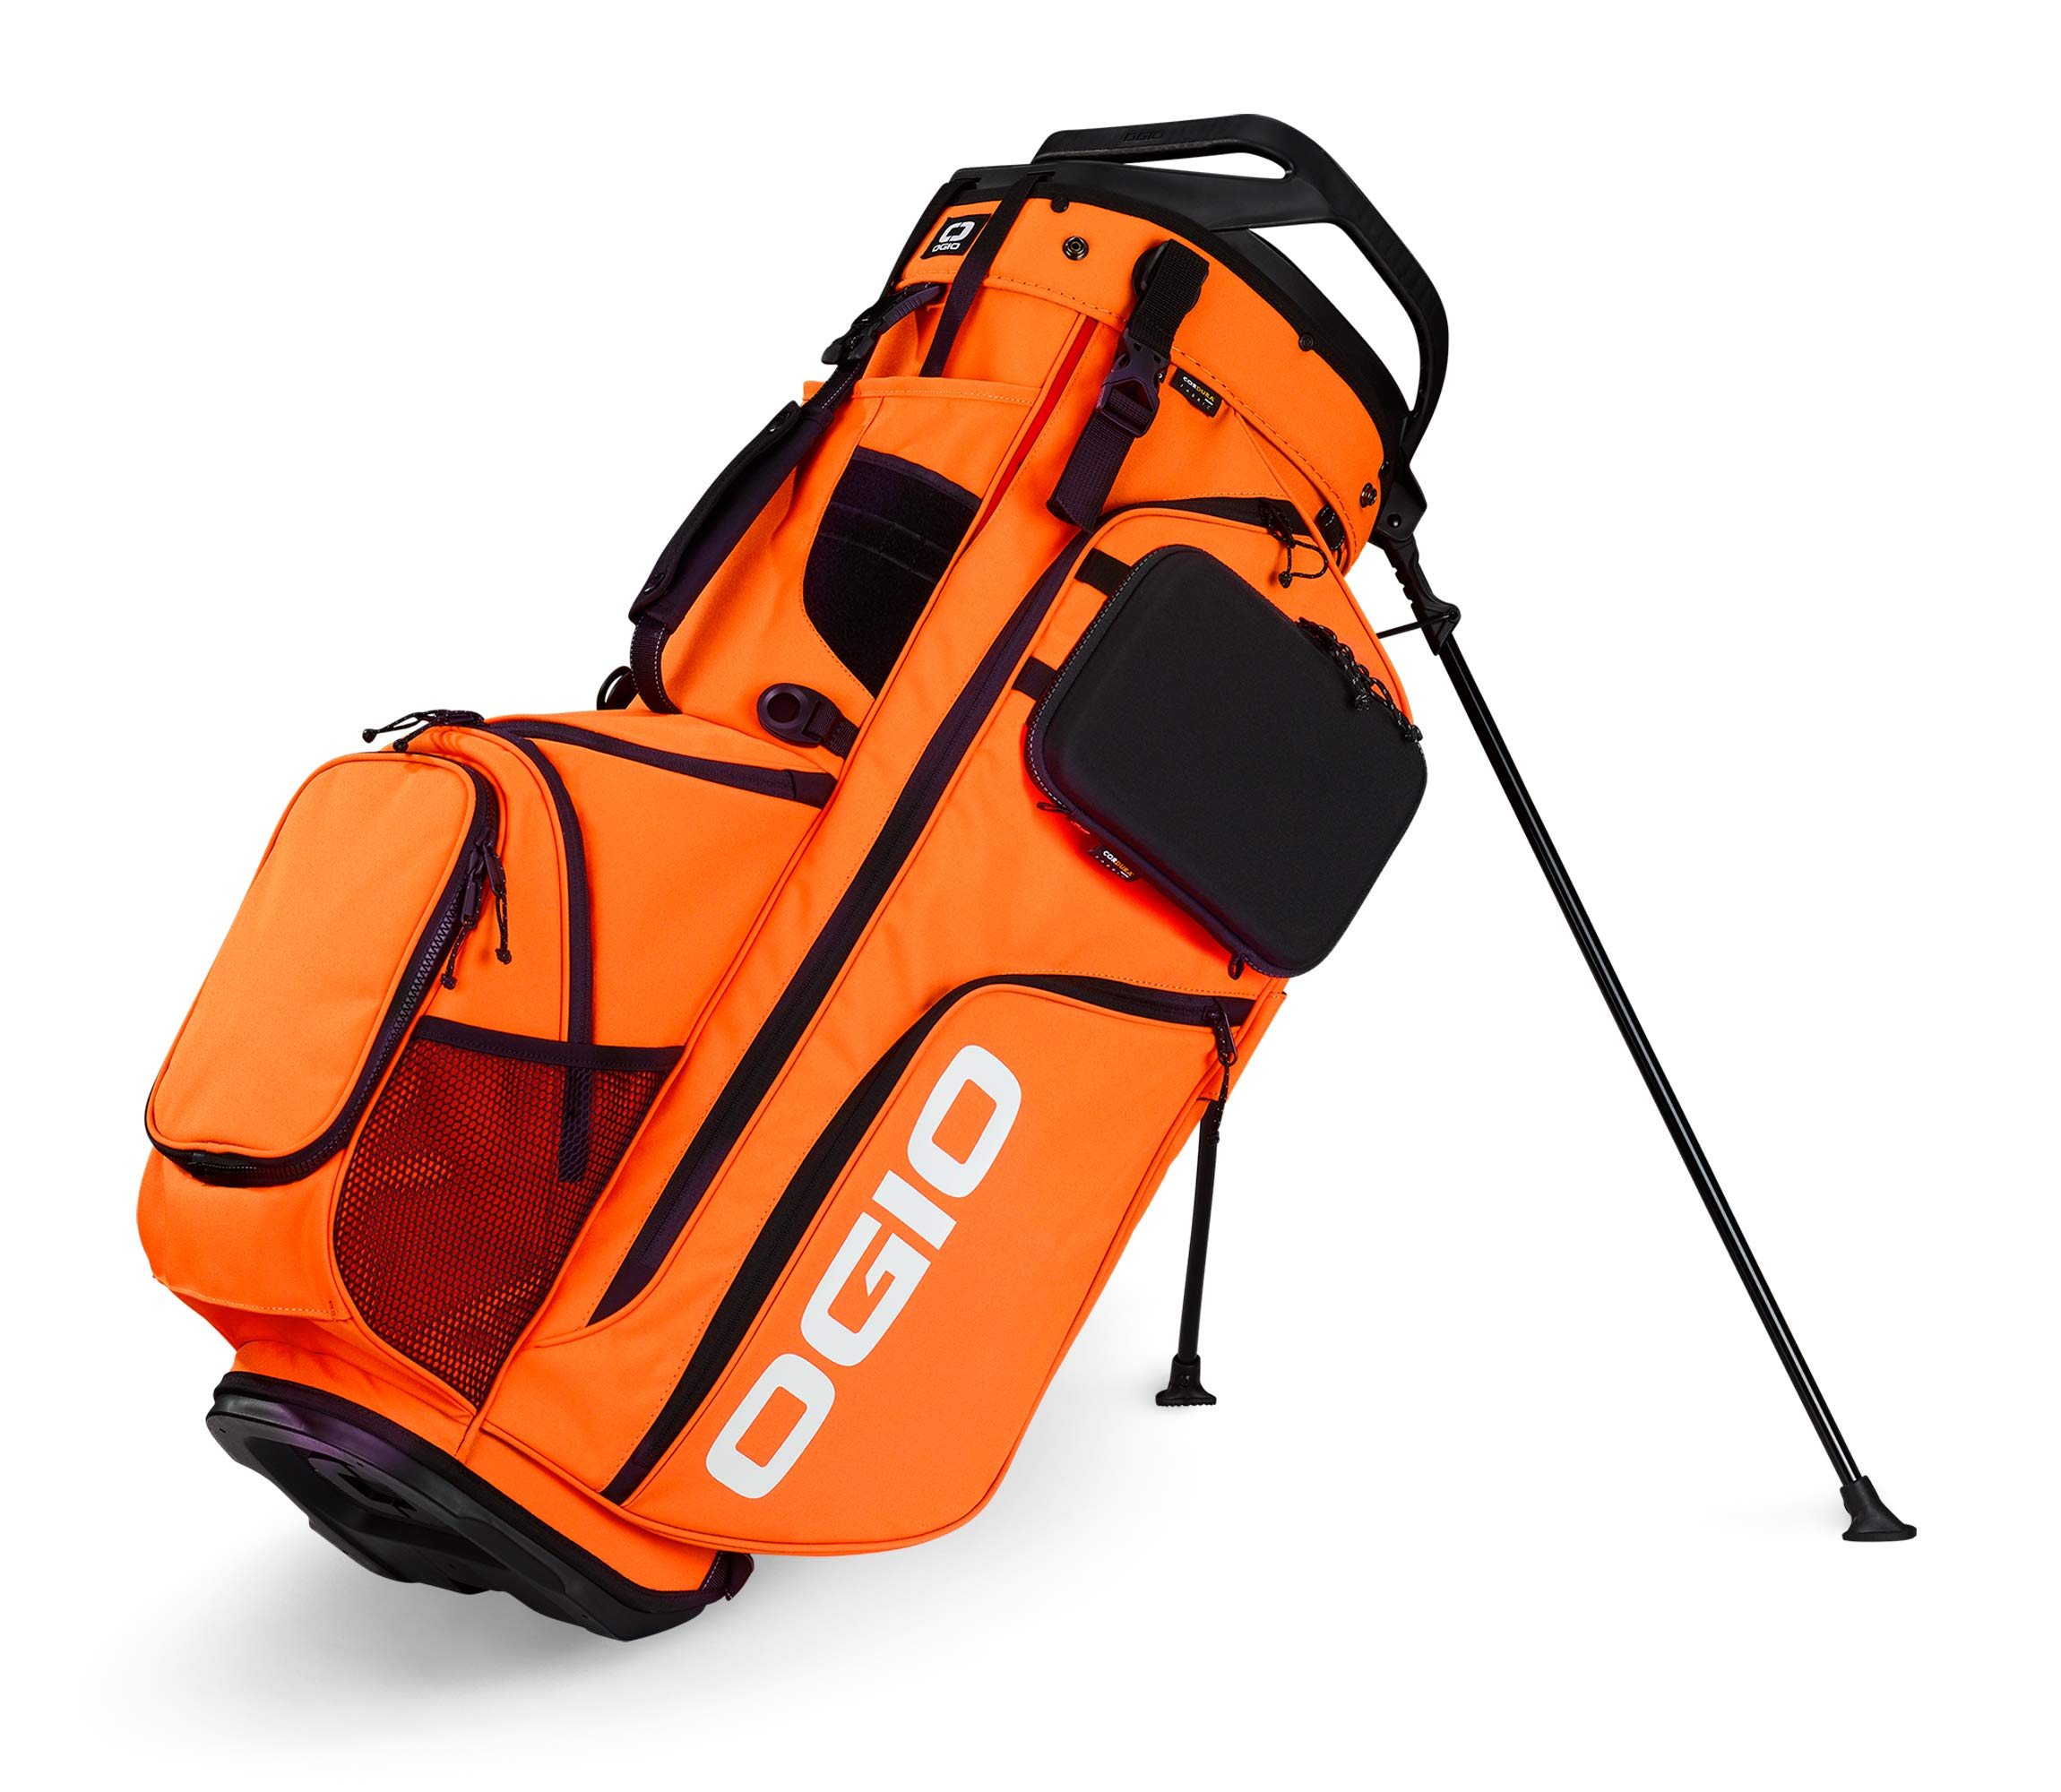 OGIO ALPHA Convoy 514 Golf Stand Bag, Glow Orange by OGIO